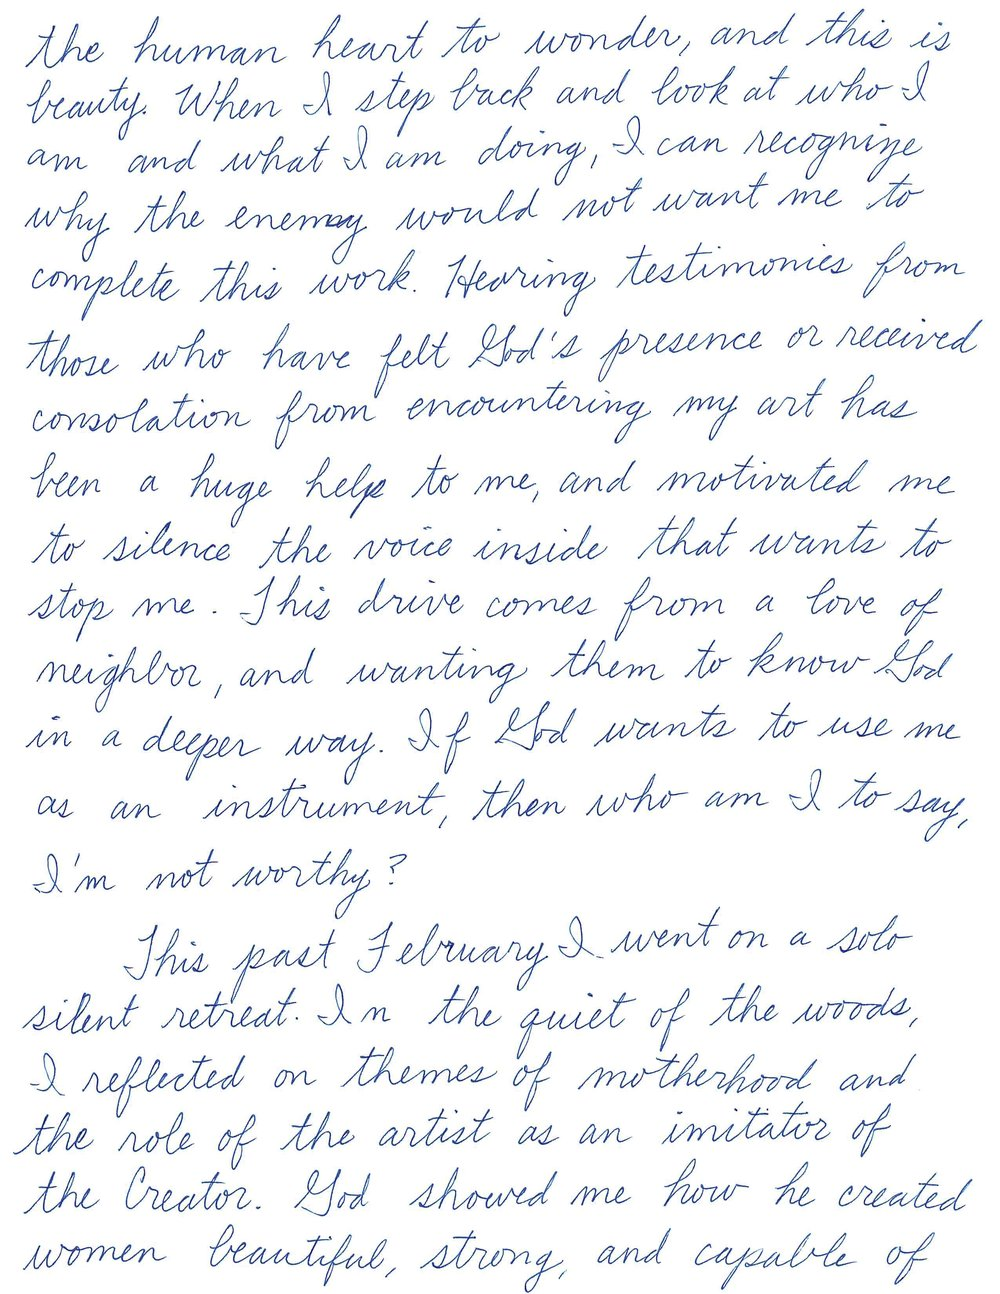 Handwritten Letter to Women final4.jpg